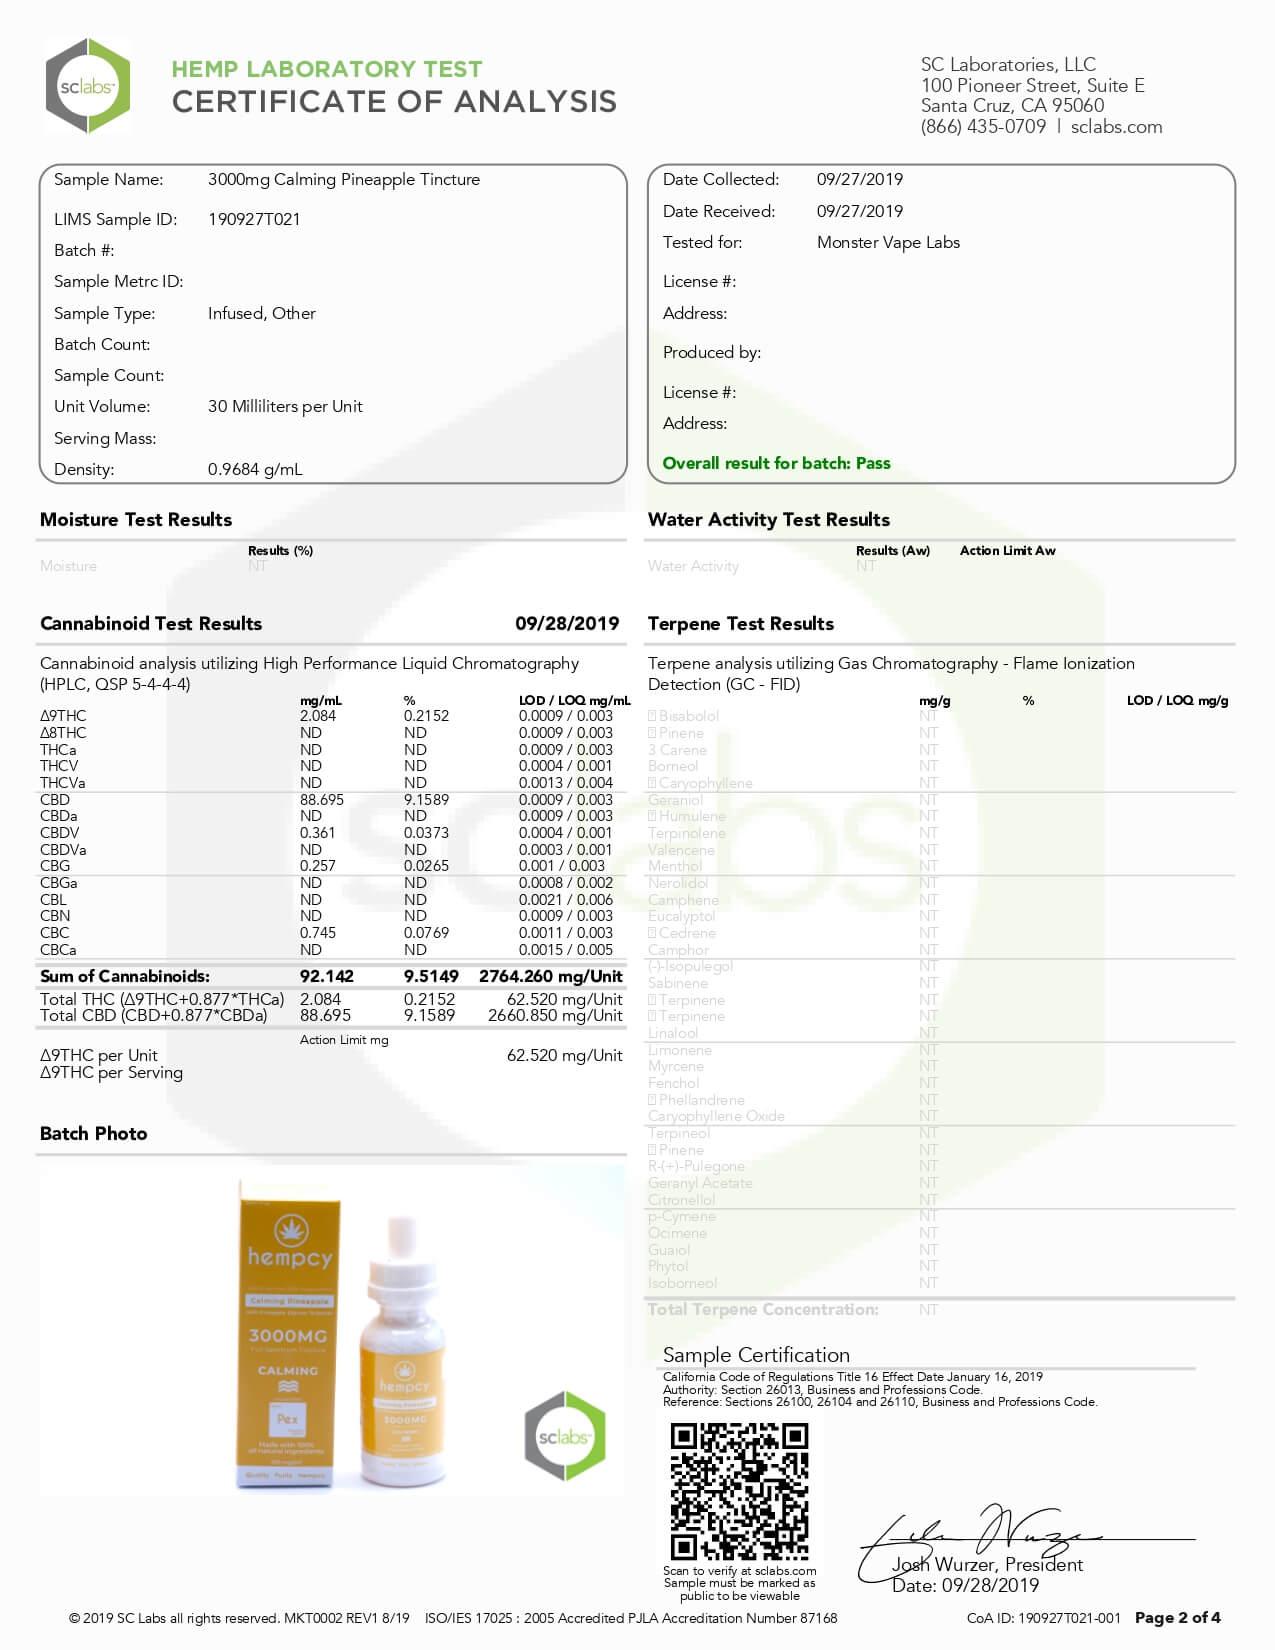 Hempcy CBD Tincture Calming Pineapple 3000mg Lab Report